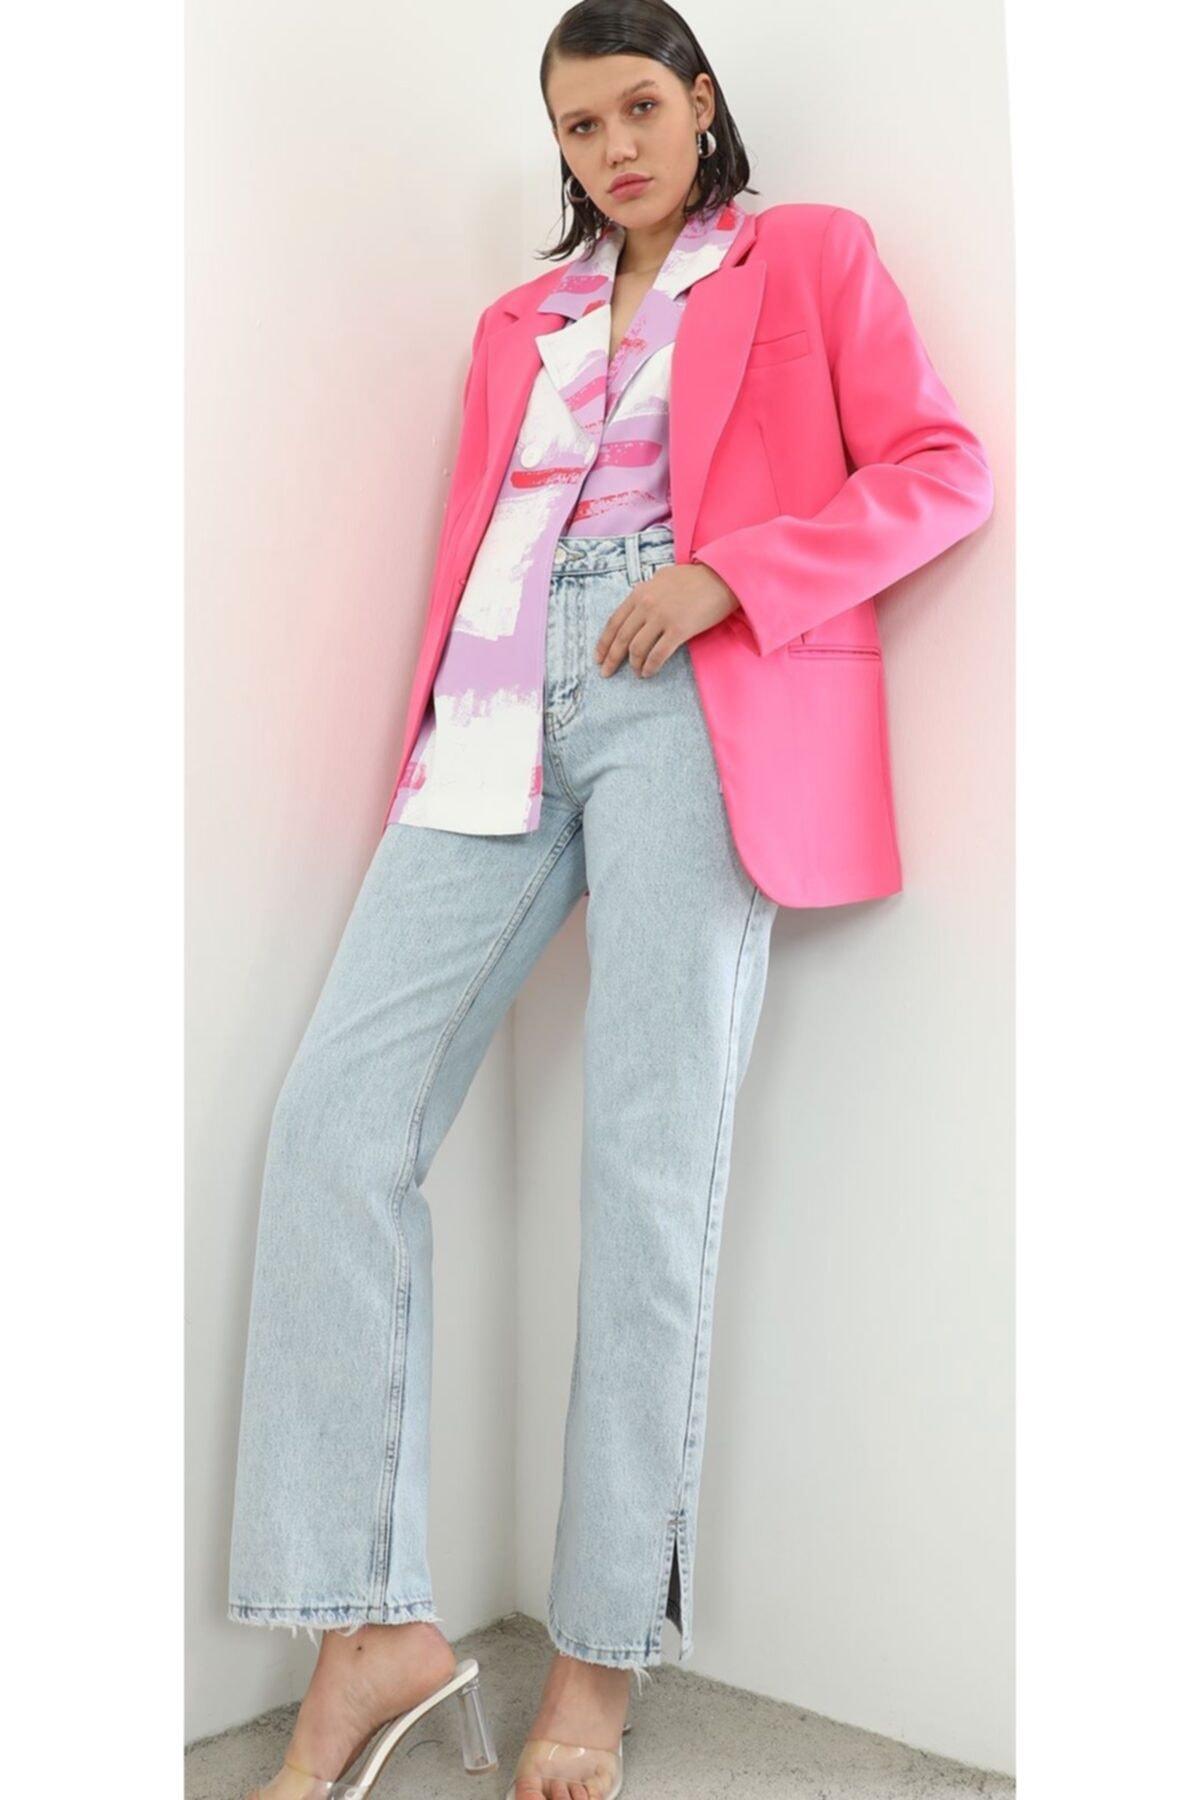 The Ness Collection Fuşya Boyfriend Blazer Ceket 2